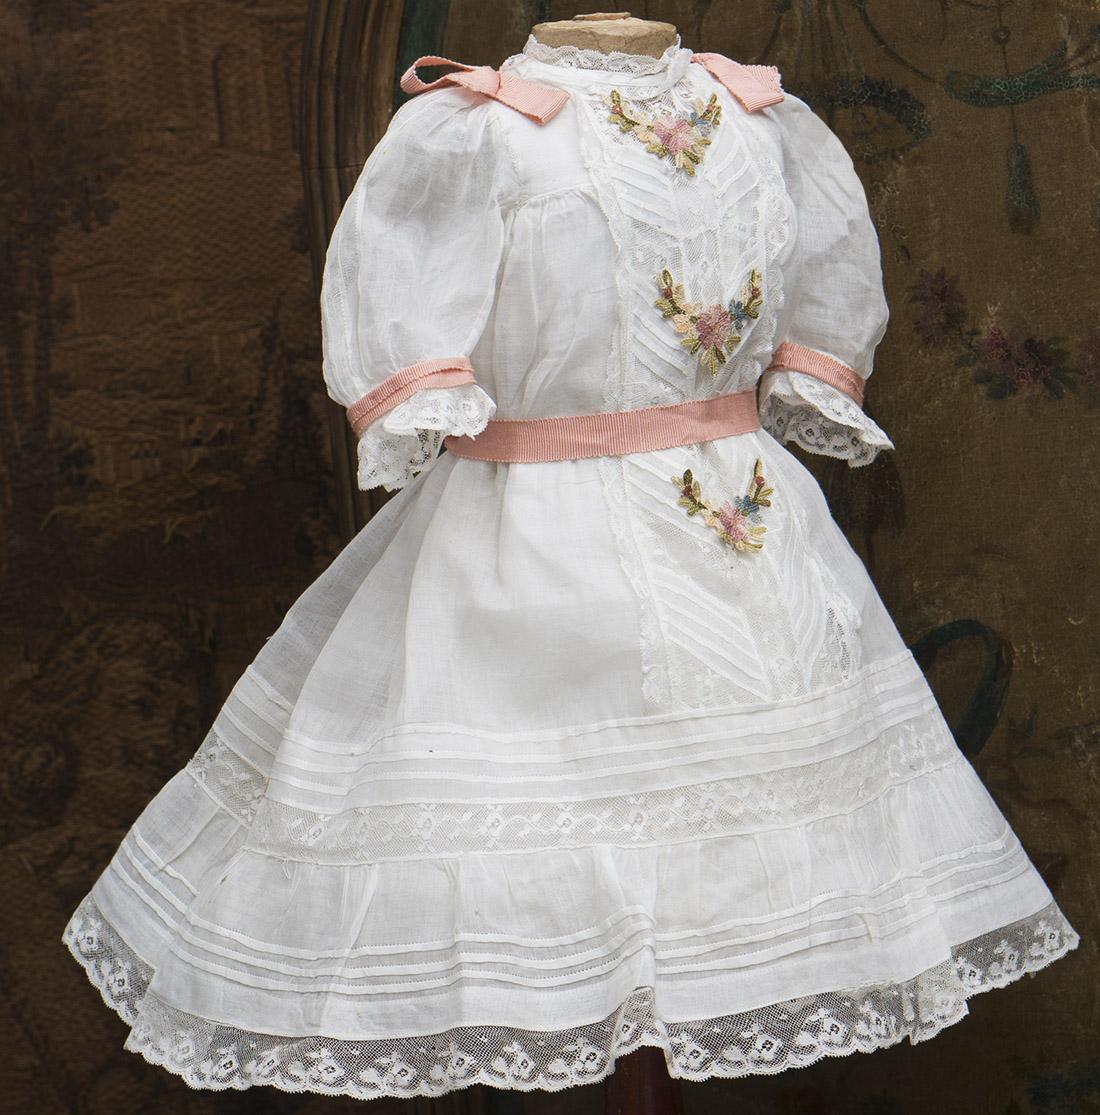 Antique Original Dress and Chemise